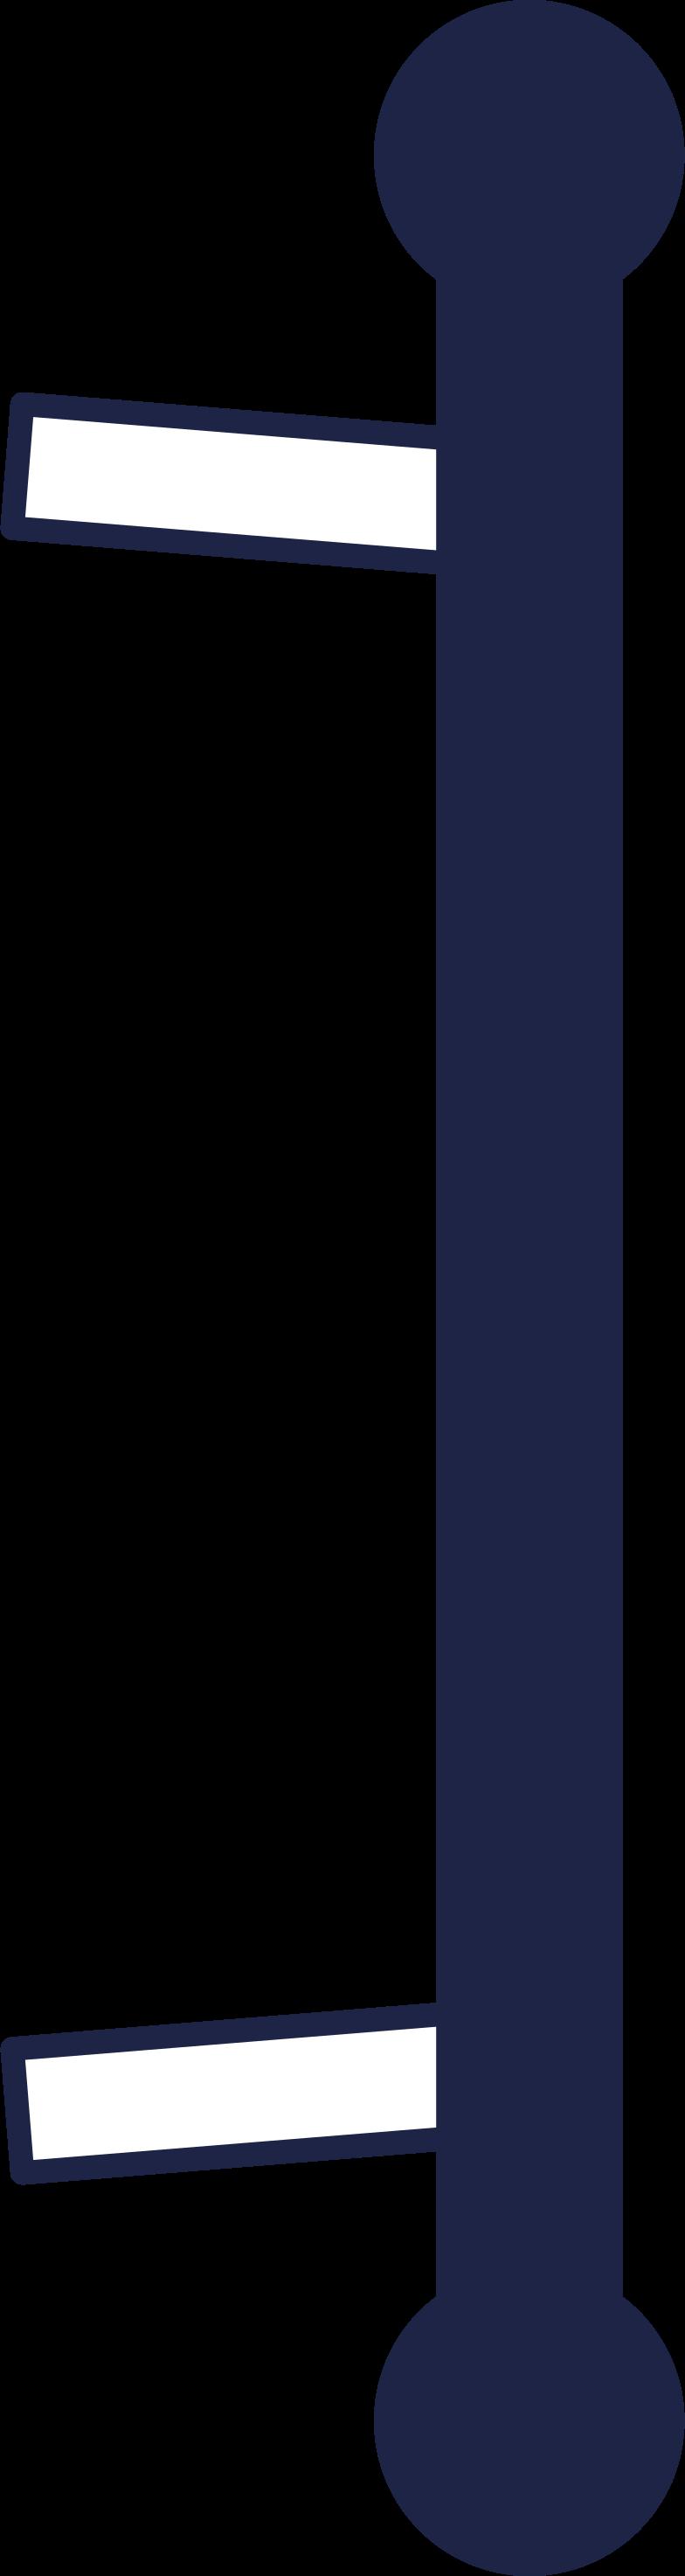 door handle 2 line Clipart illustration in PNG, SVG